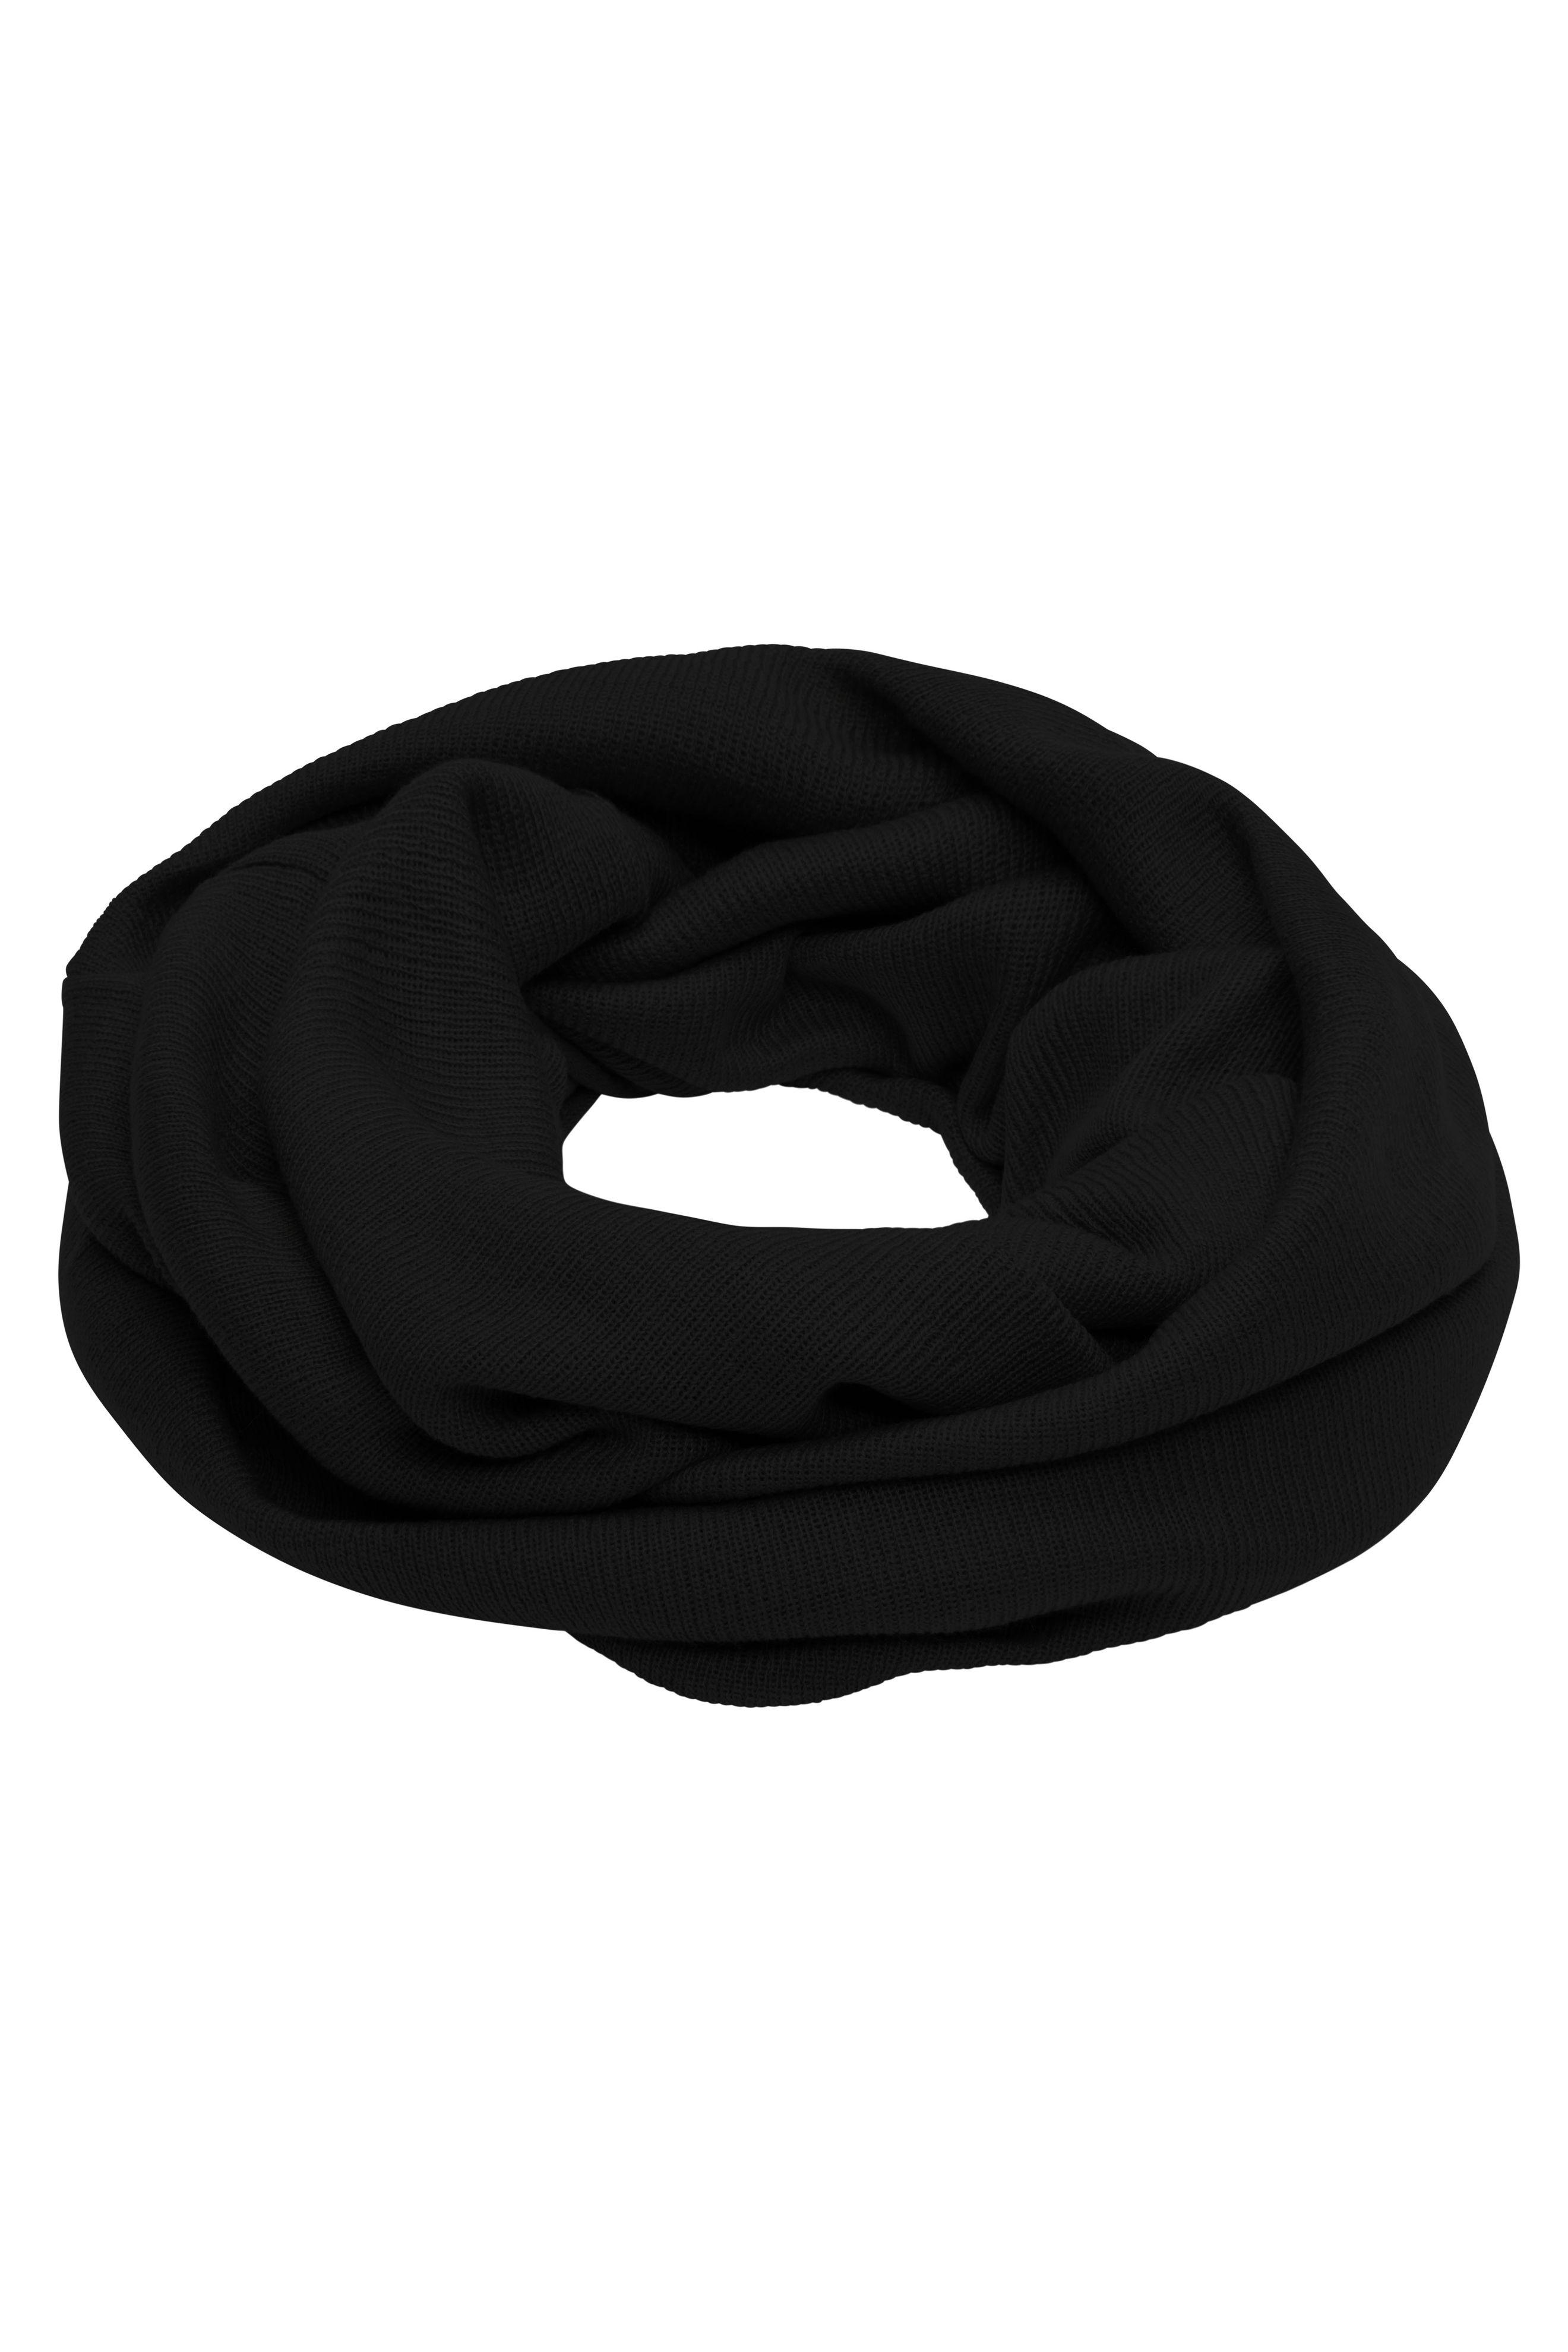 Lässiger Loop-Schal